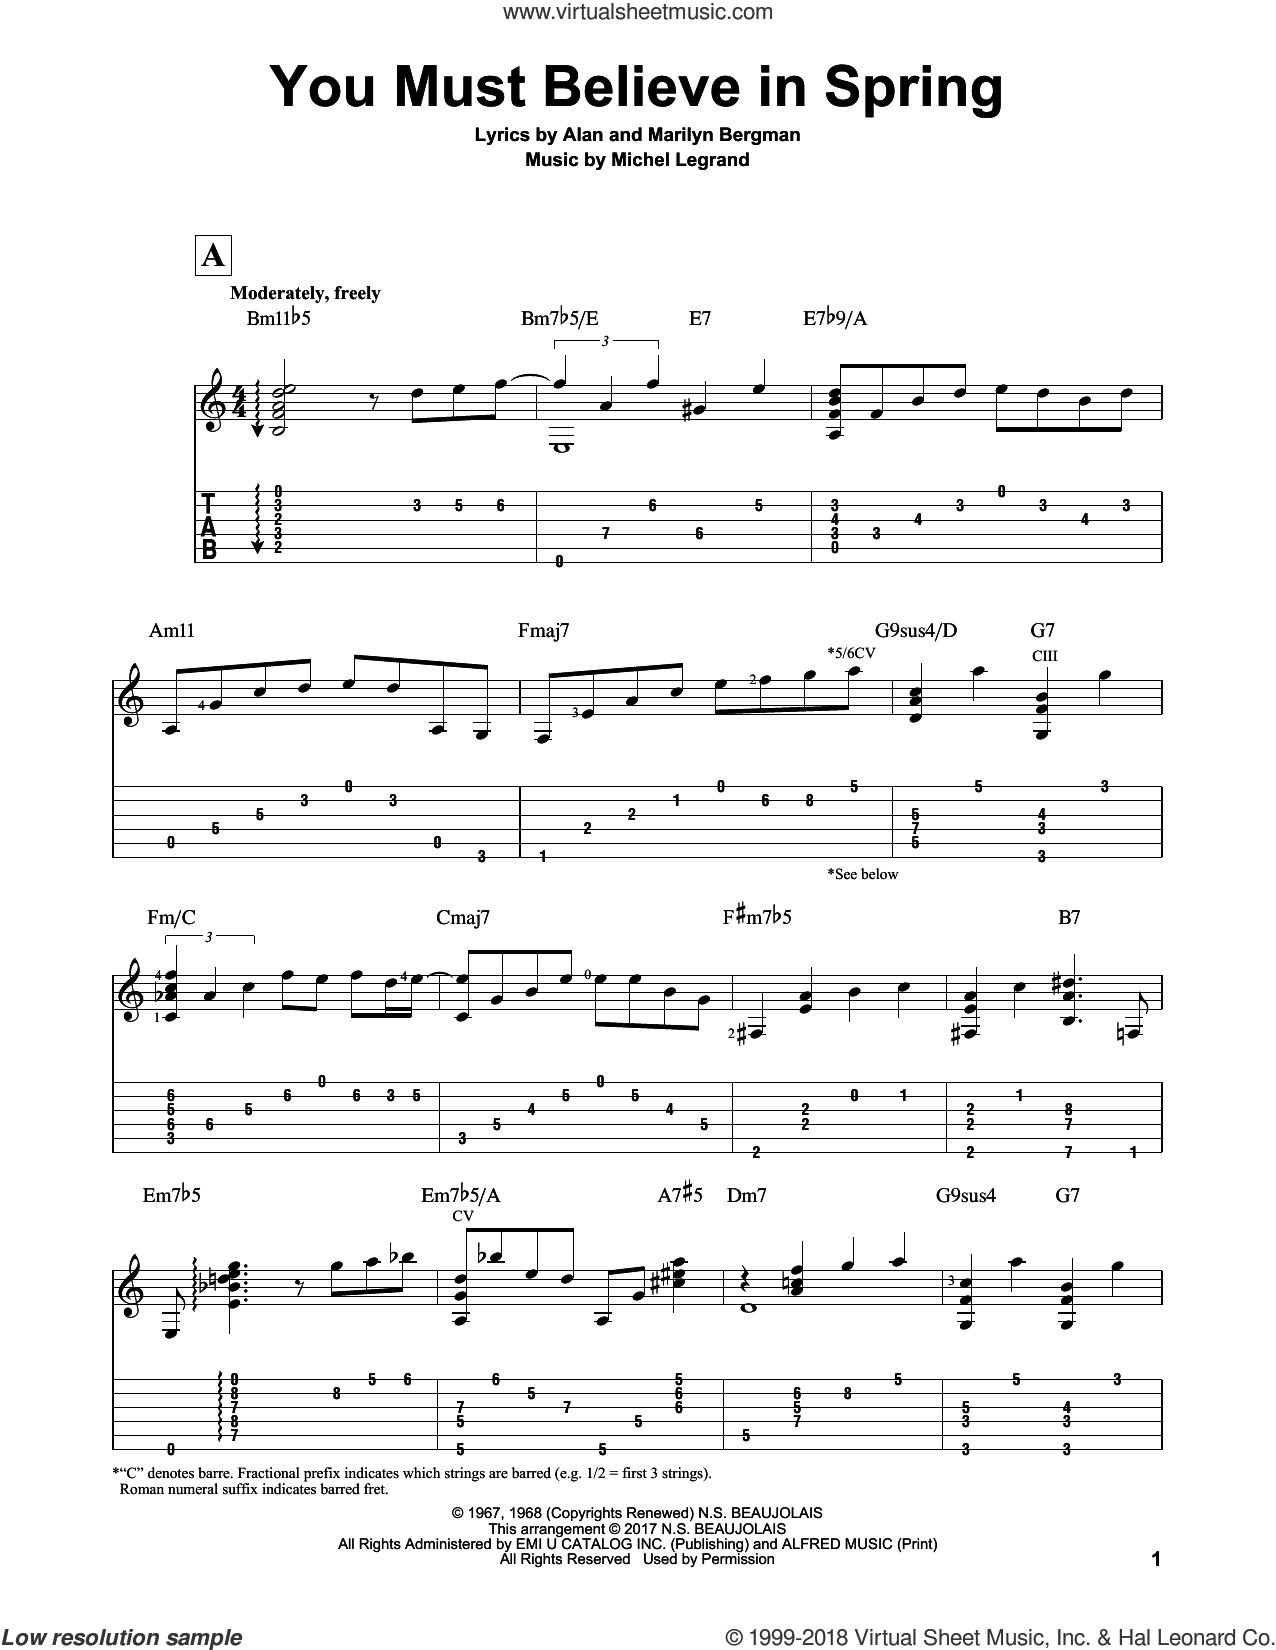 You Must Believe In Spring sheet music for guitar solo by Michel Legrand, Matt Otten, Alan Bergman and Marilyn Bergman, intermediate skill level